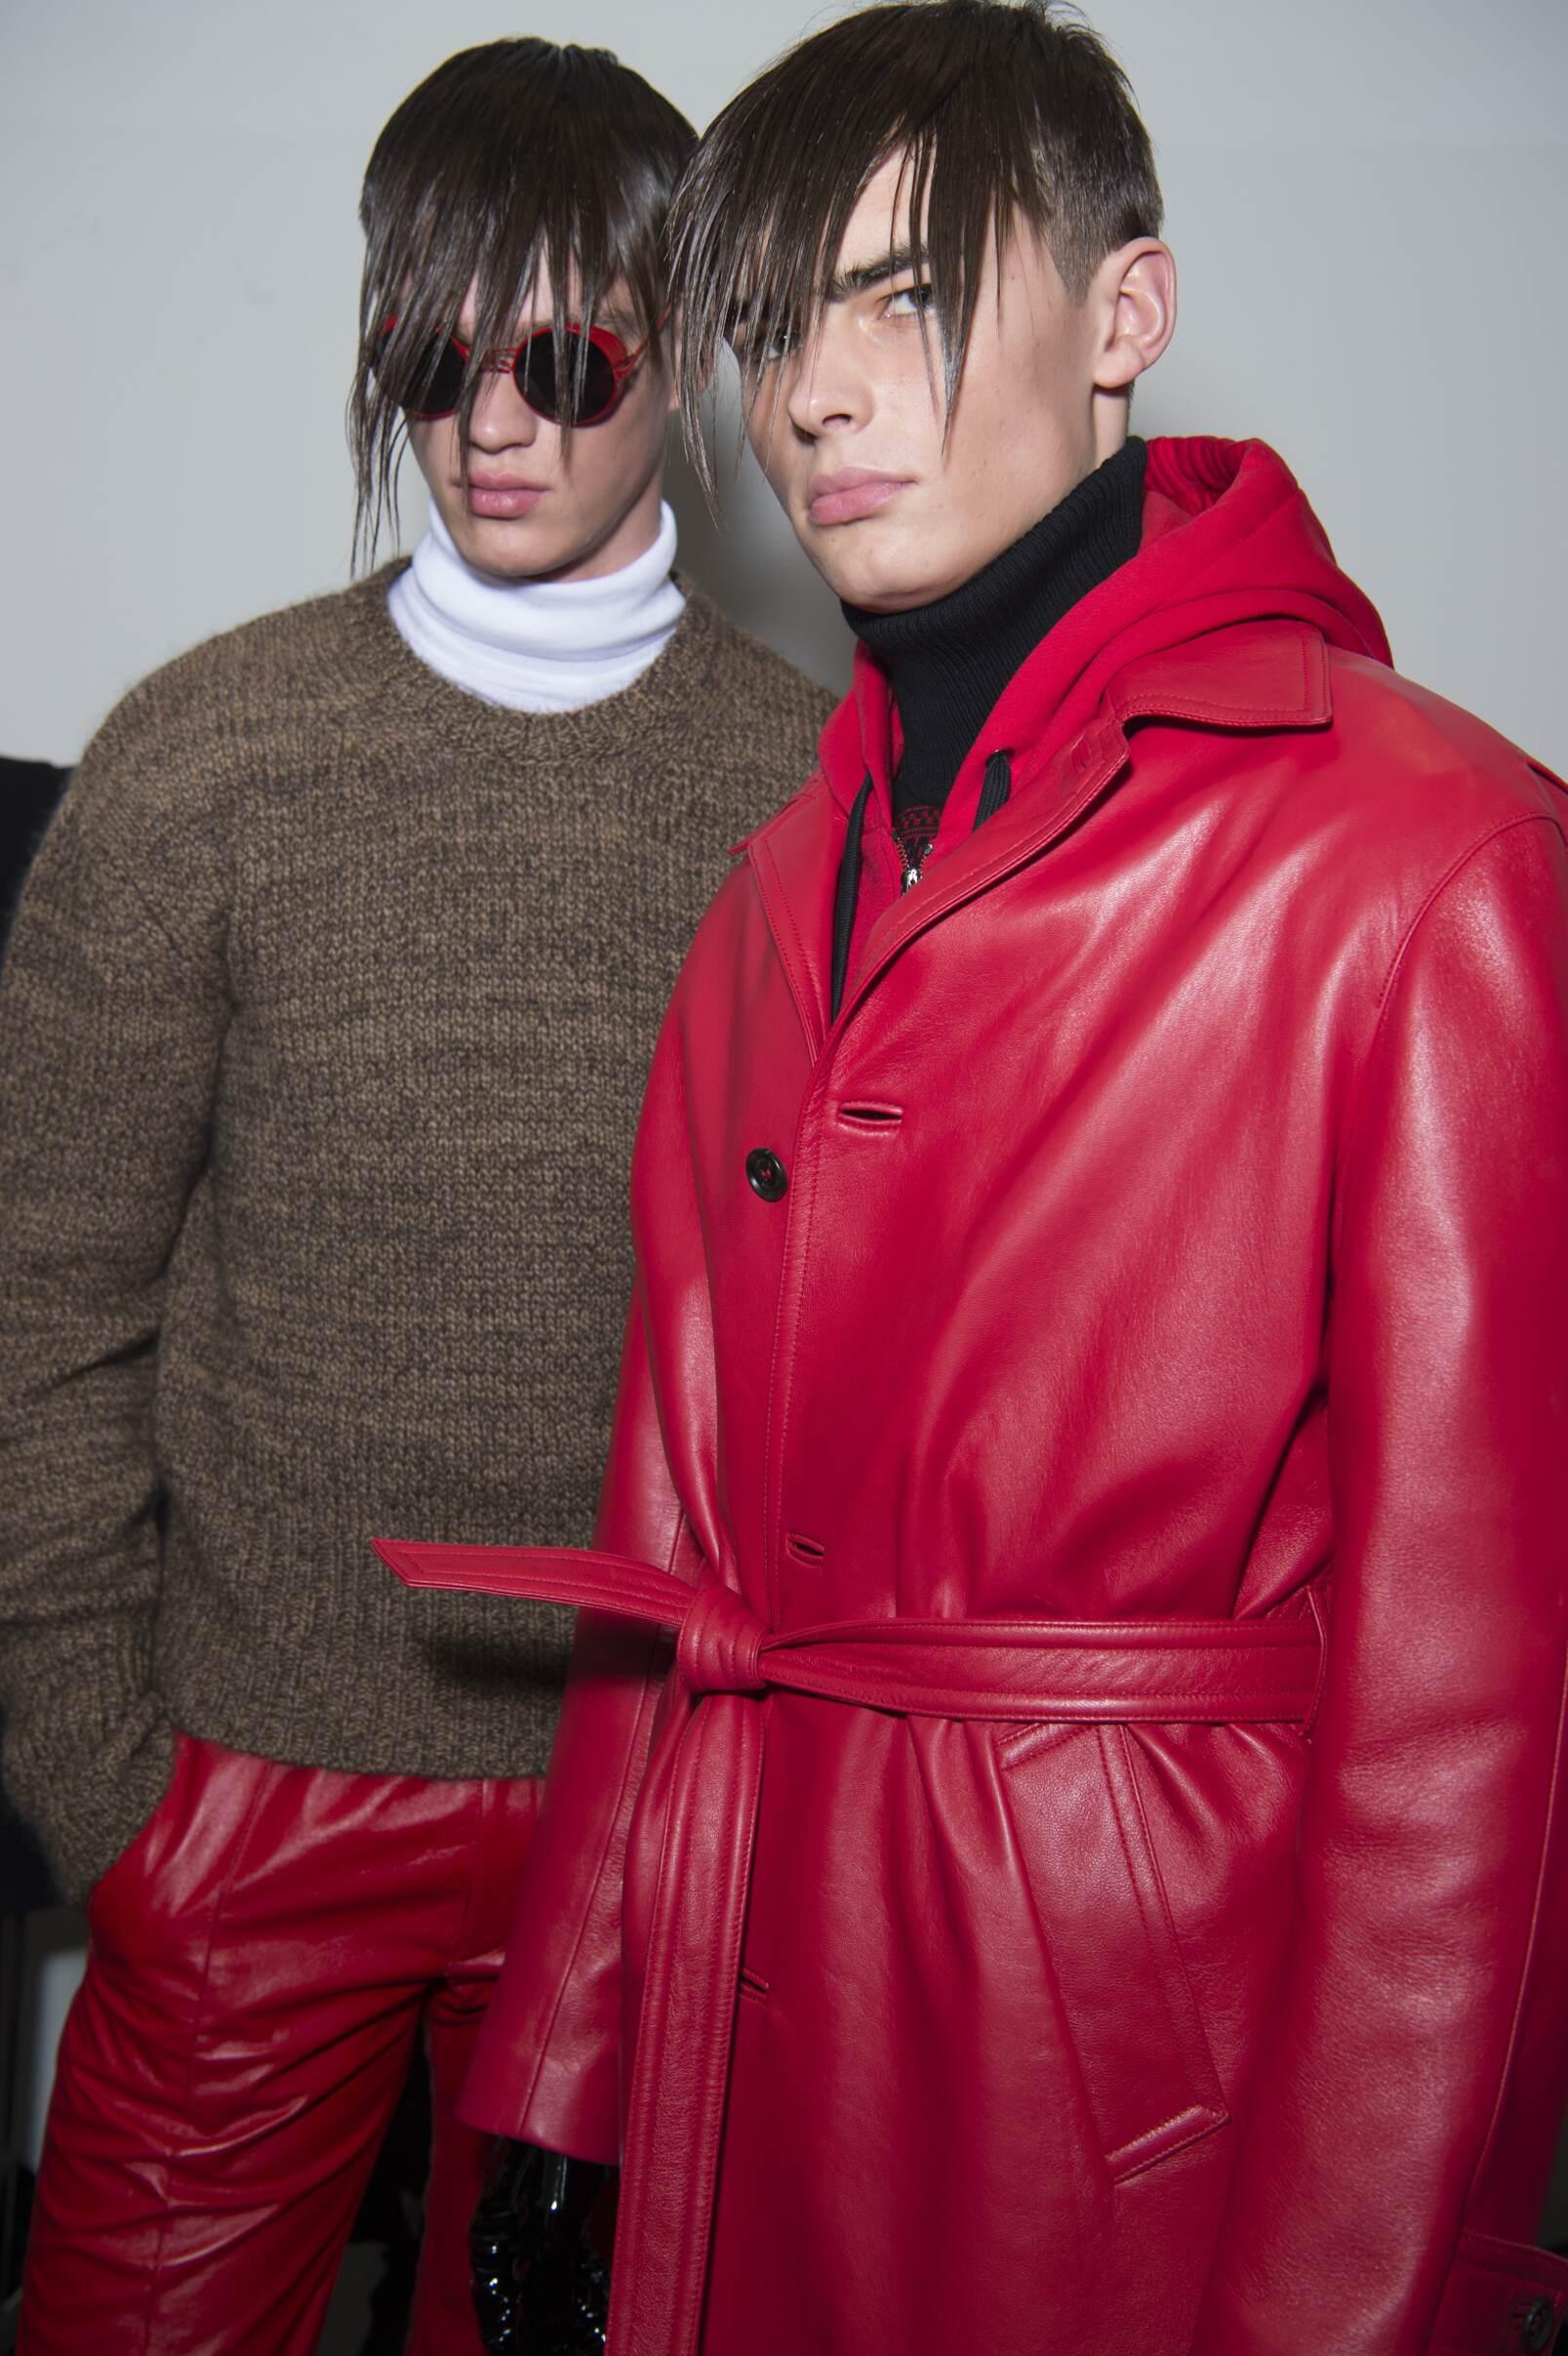 Backstage Versace Fashion Show Model